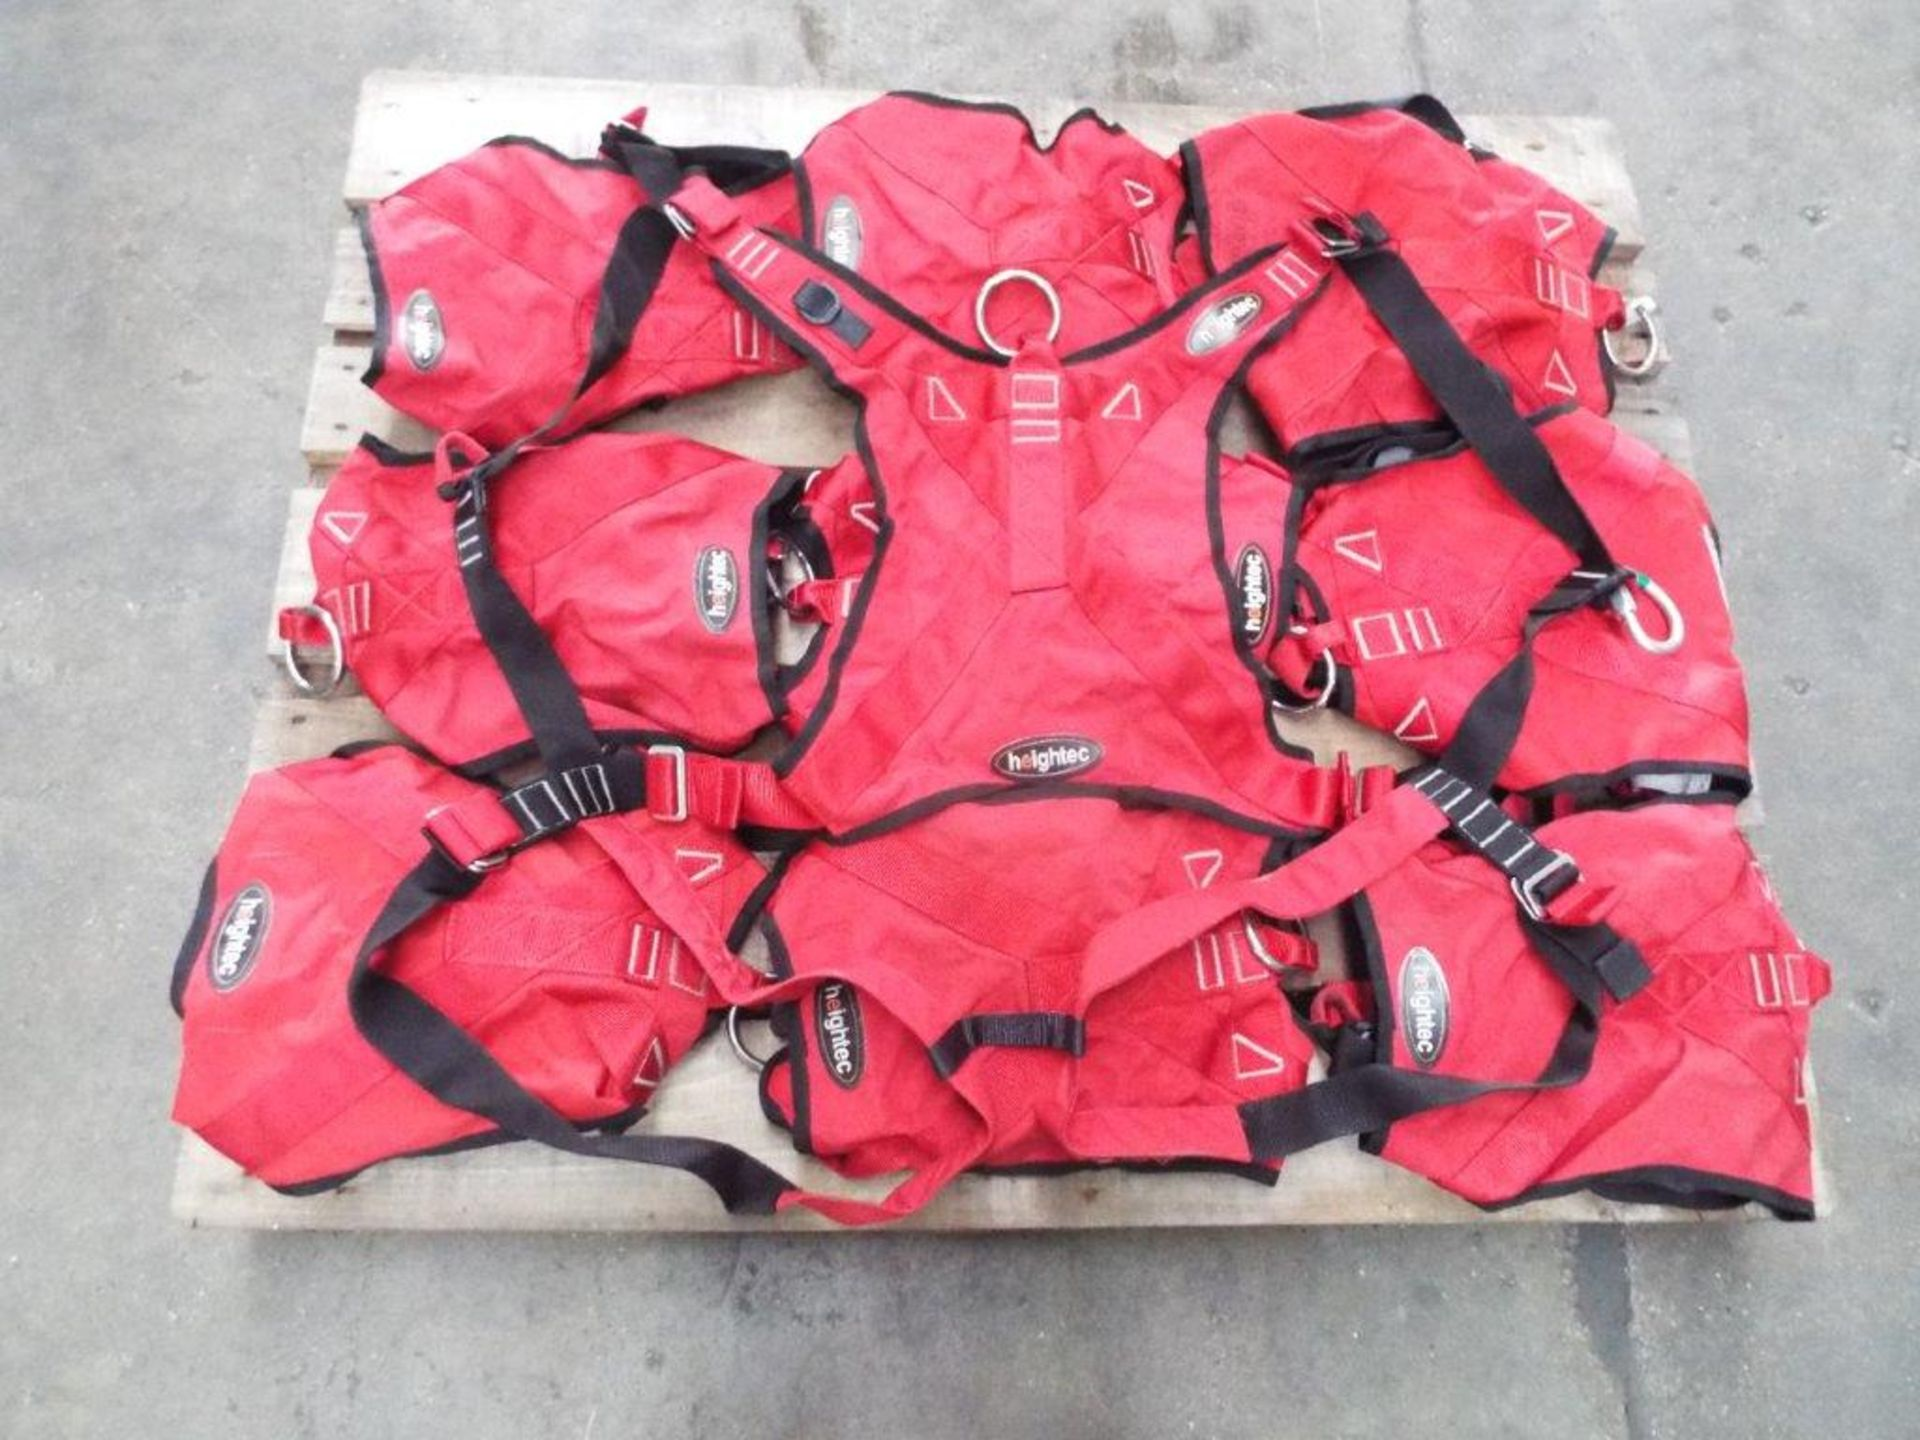 Lot 24488 - 10 x Heightec Phoenix H11 Rescue Harness